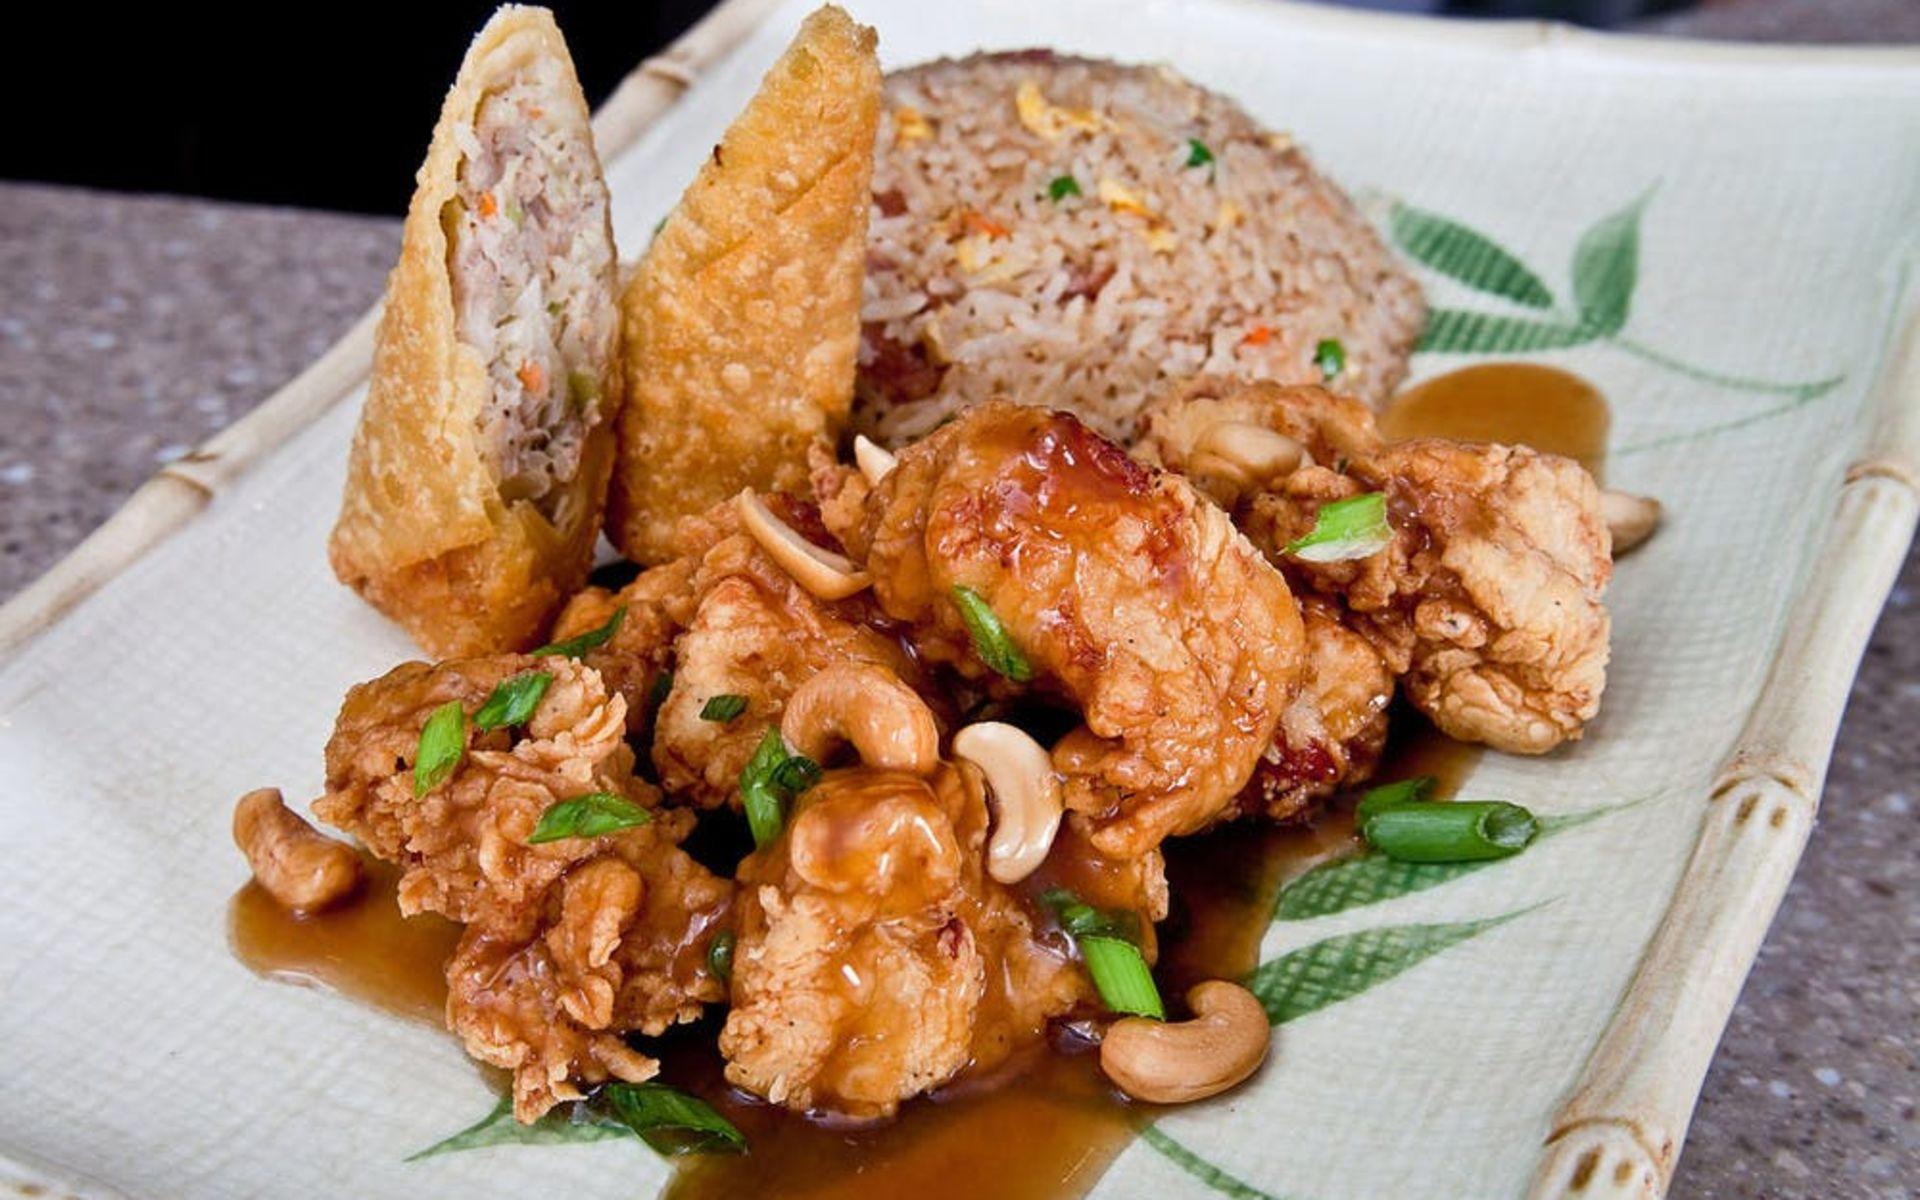 Leong's Cashew Chicken Plate